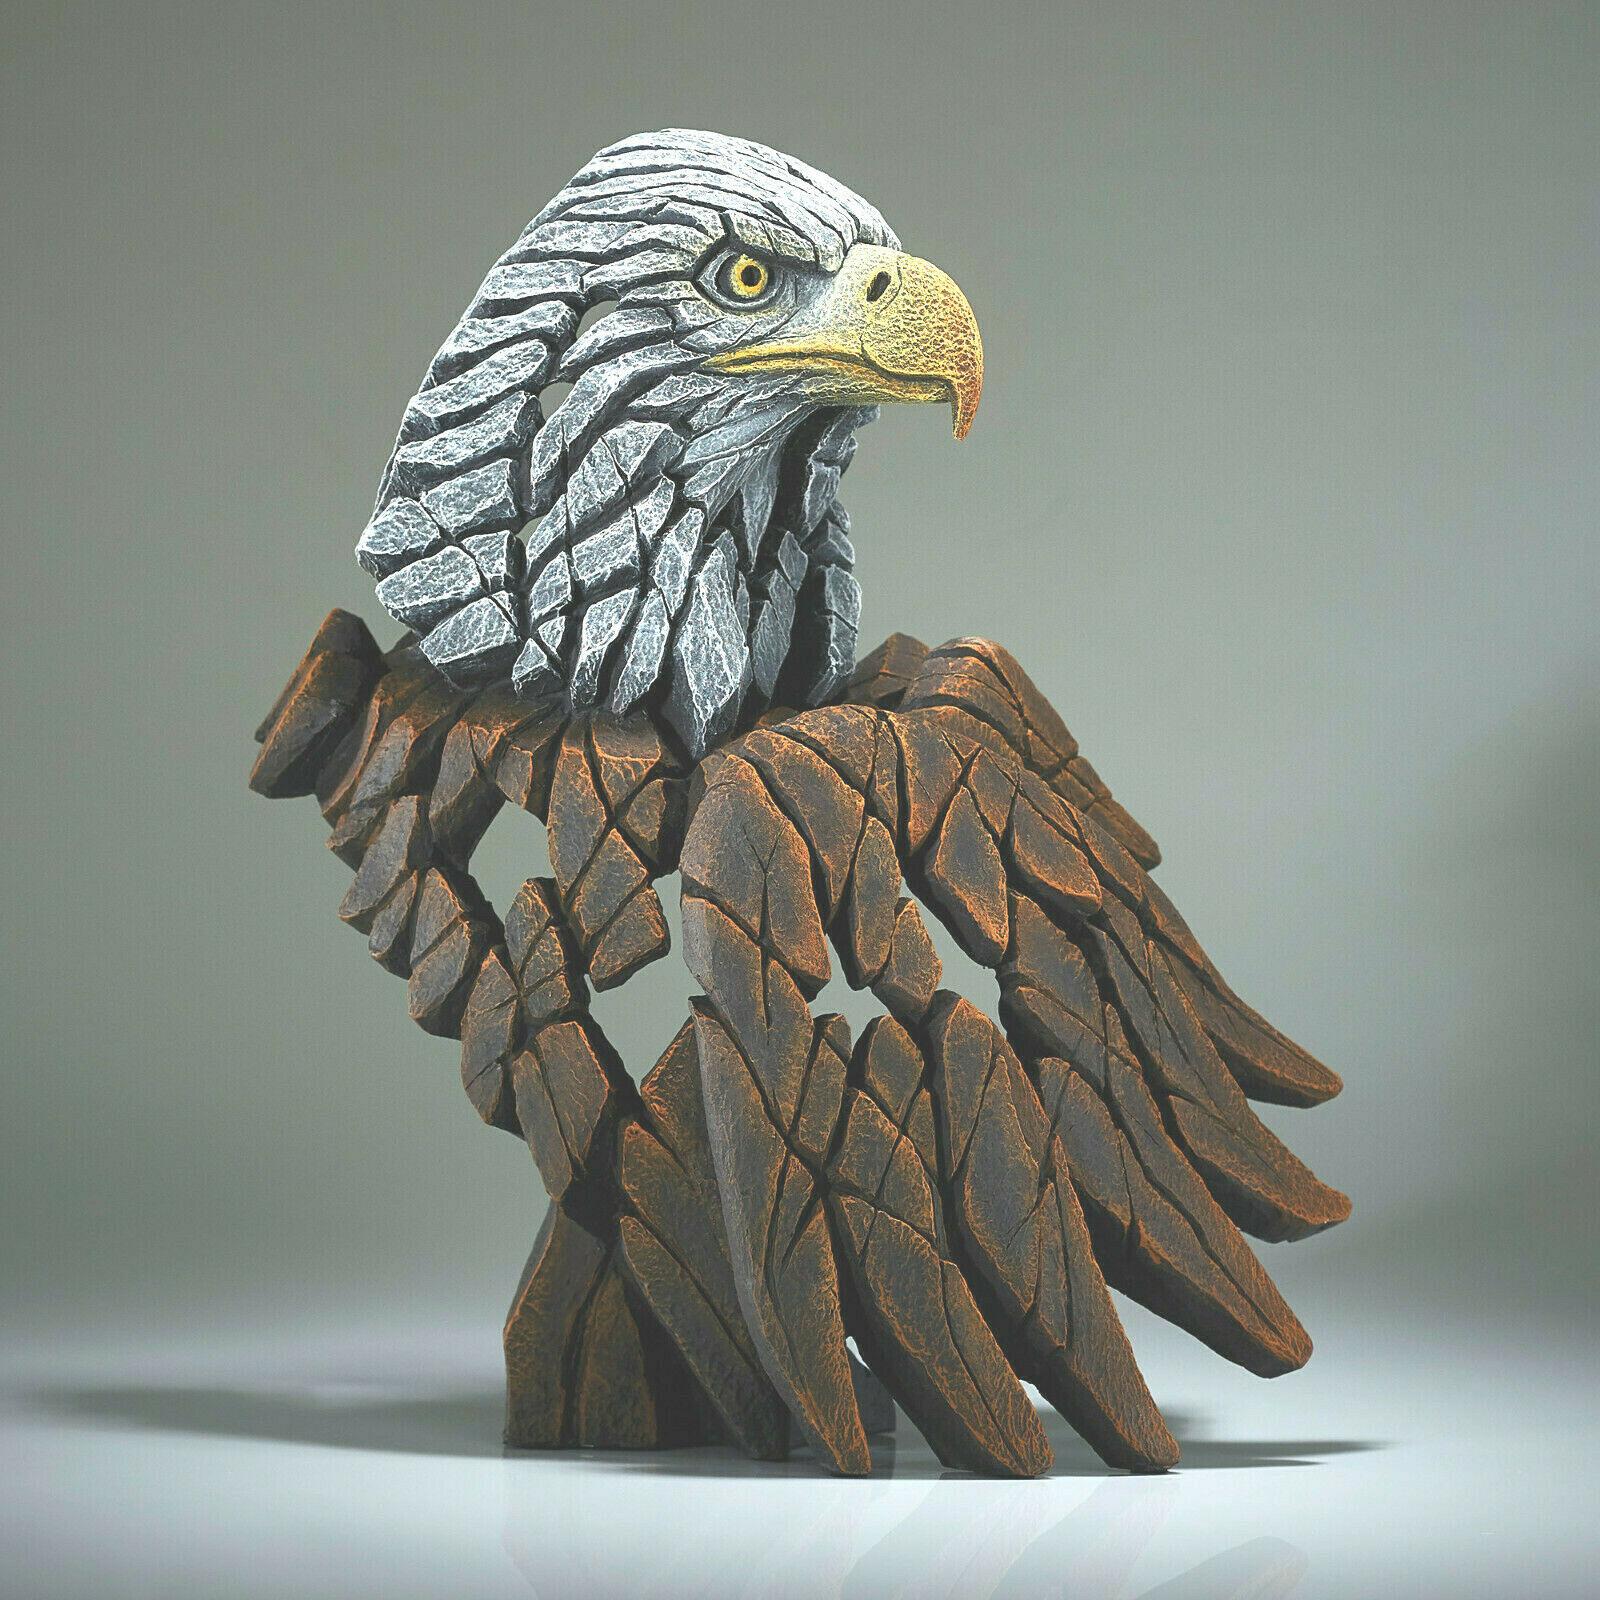 "14.5"" Bald Eagle Bust by Edge Sculpture - Stunning Piece"